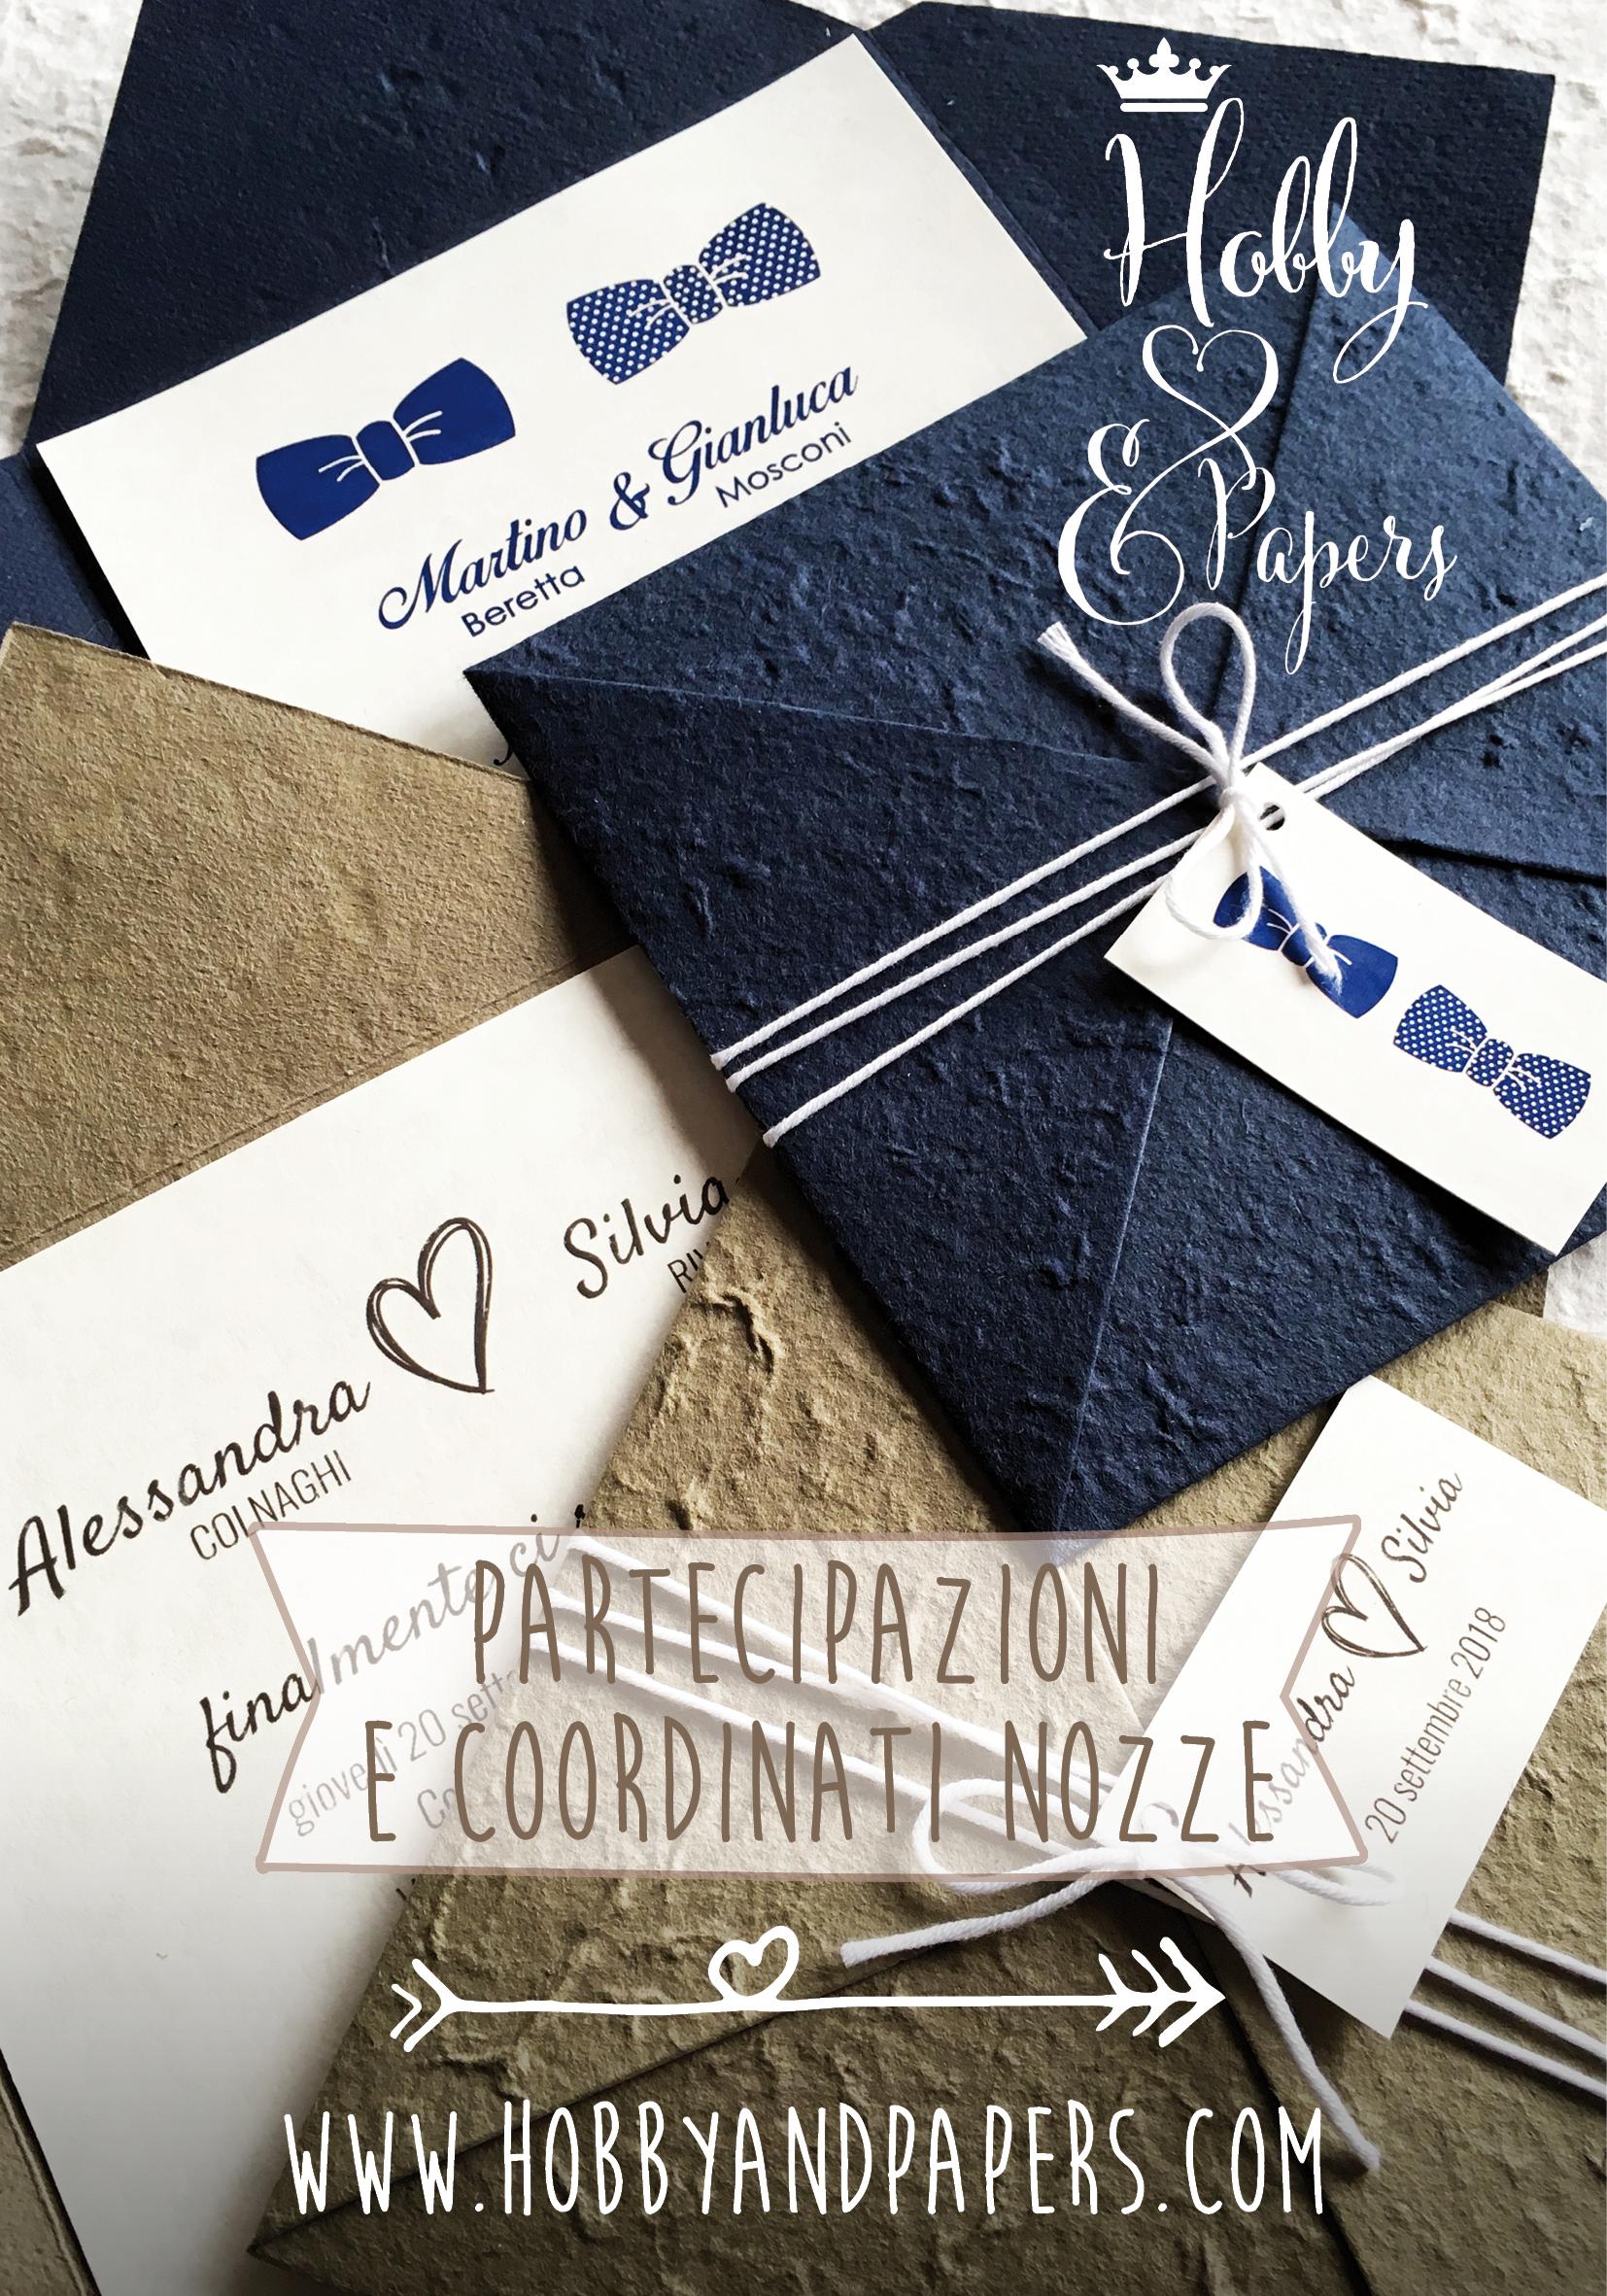 Hobby&Papers: lo stile semplice ed elegante.